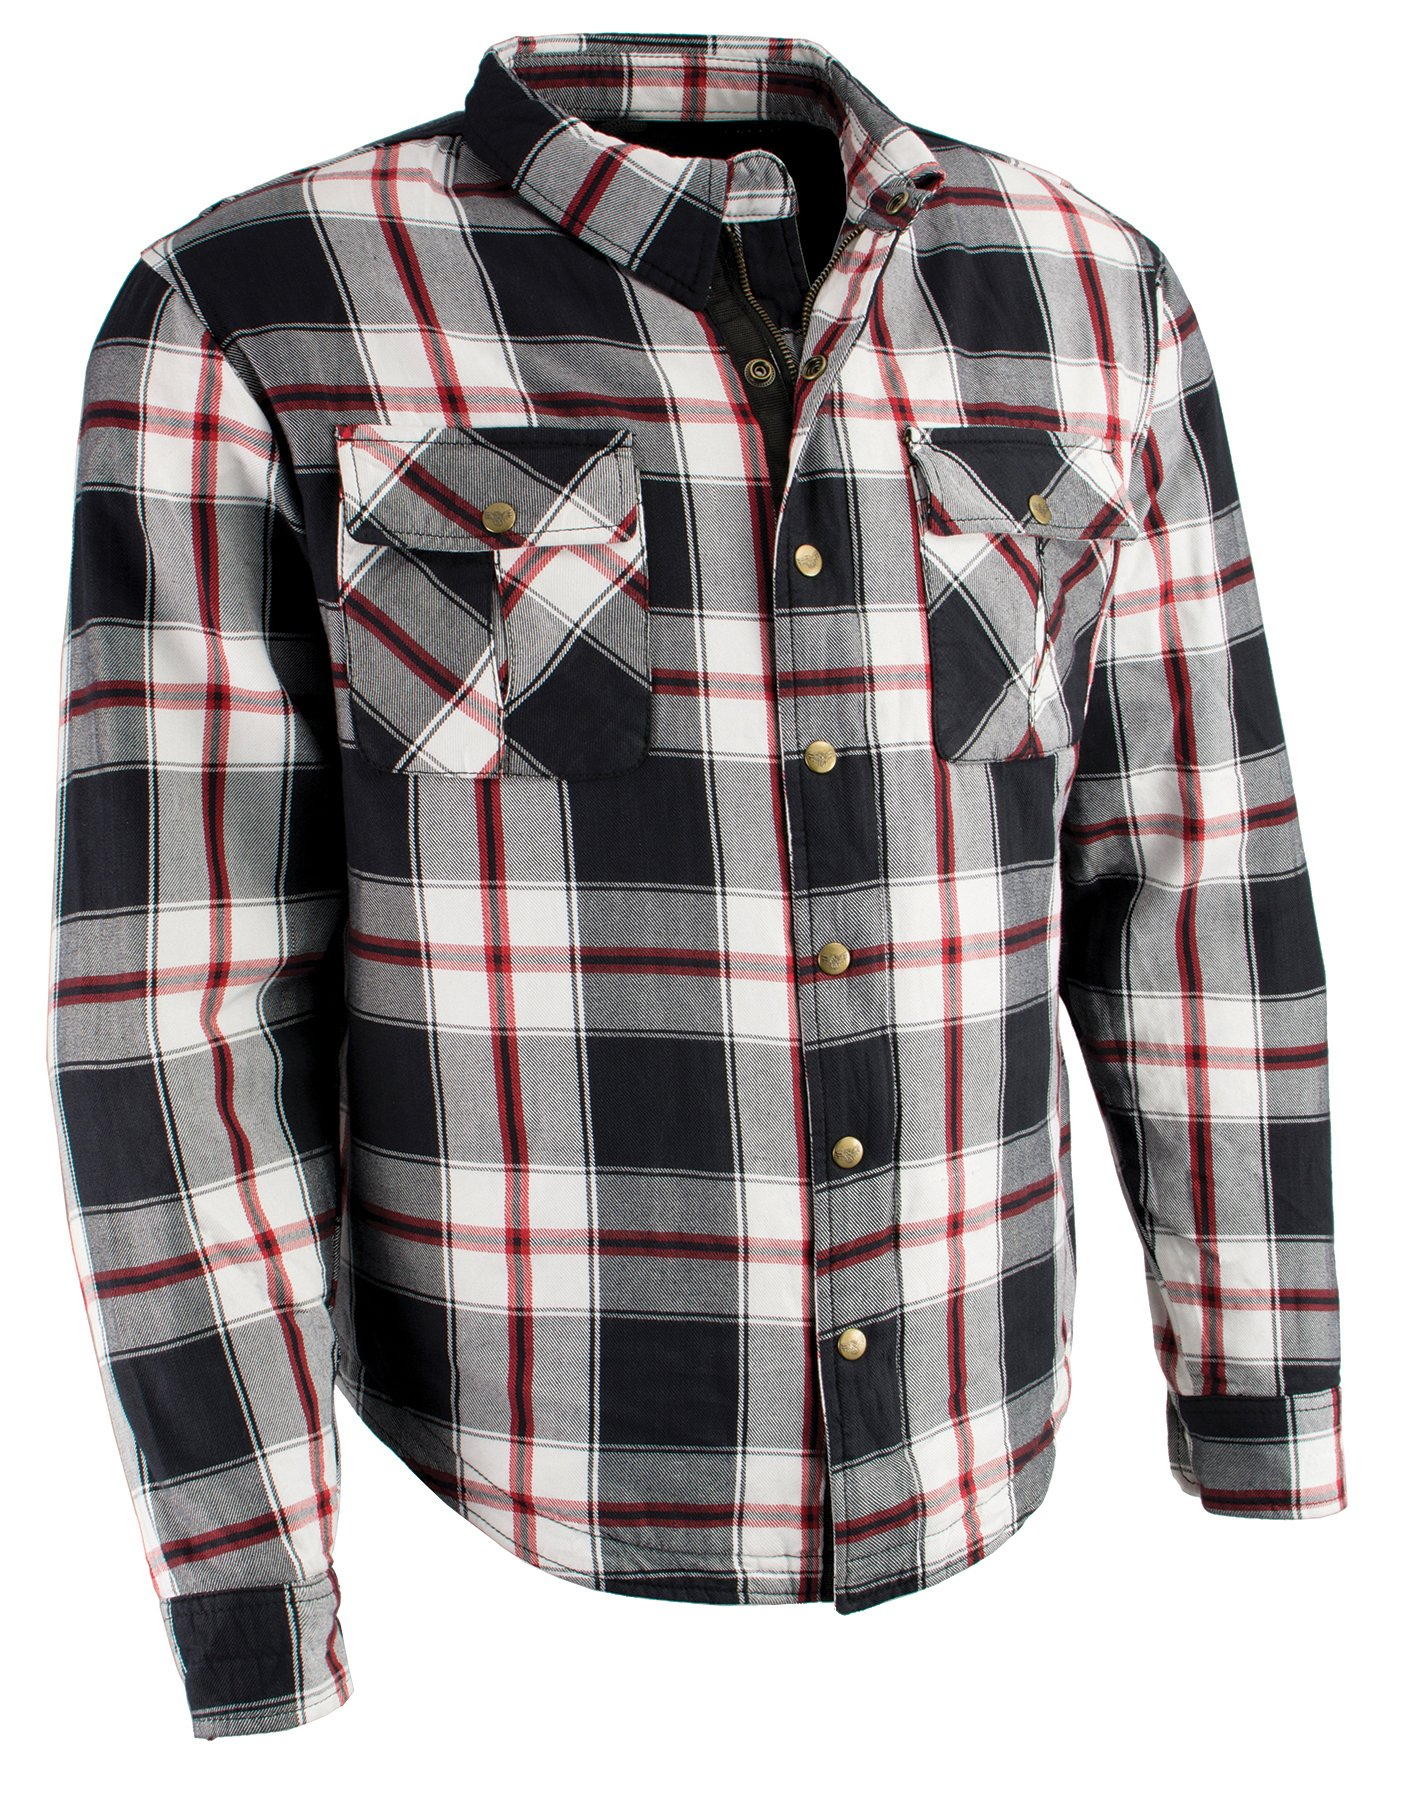 Milwaukee Performance Men's Flannel Biker Shirt with Aramid (Black/White/Red, 2X)